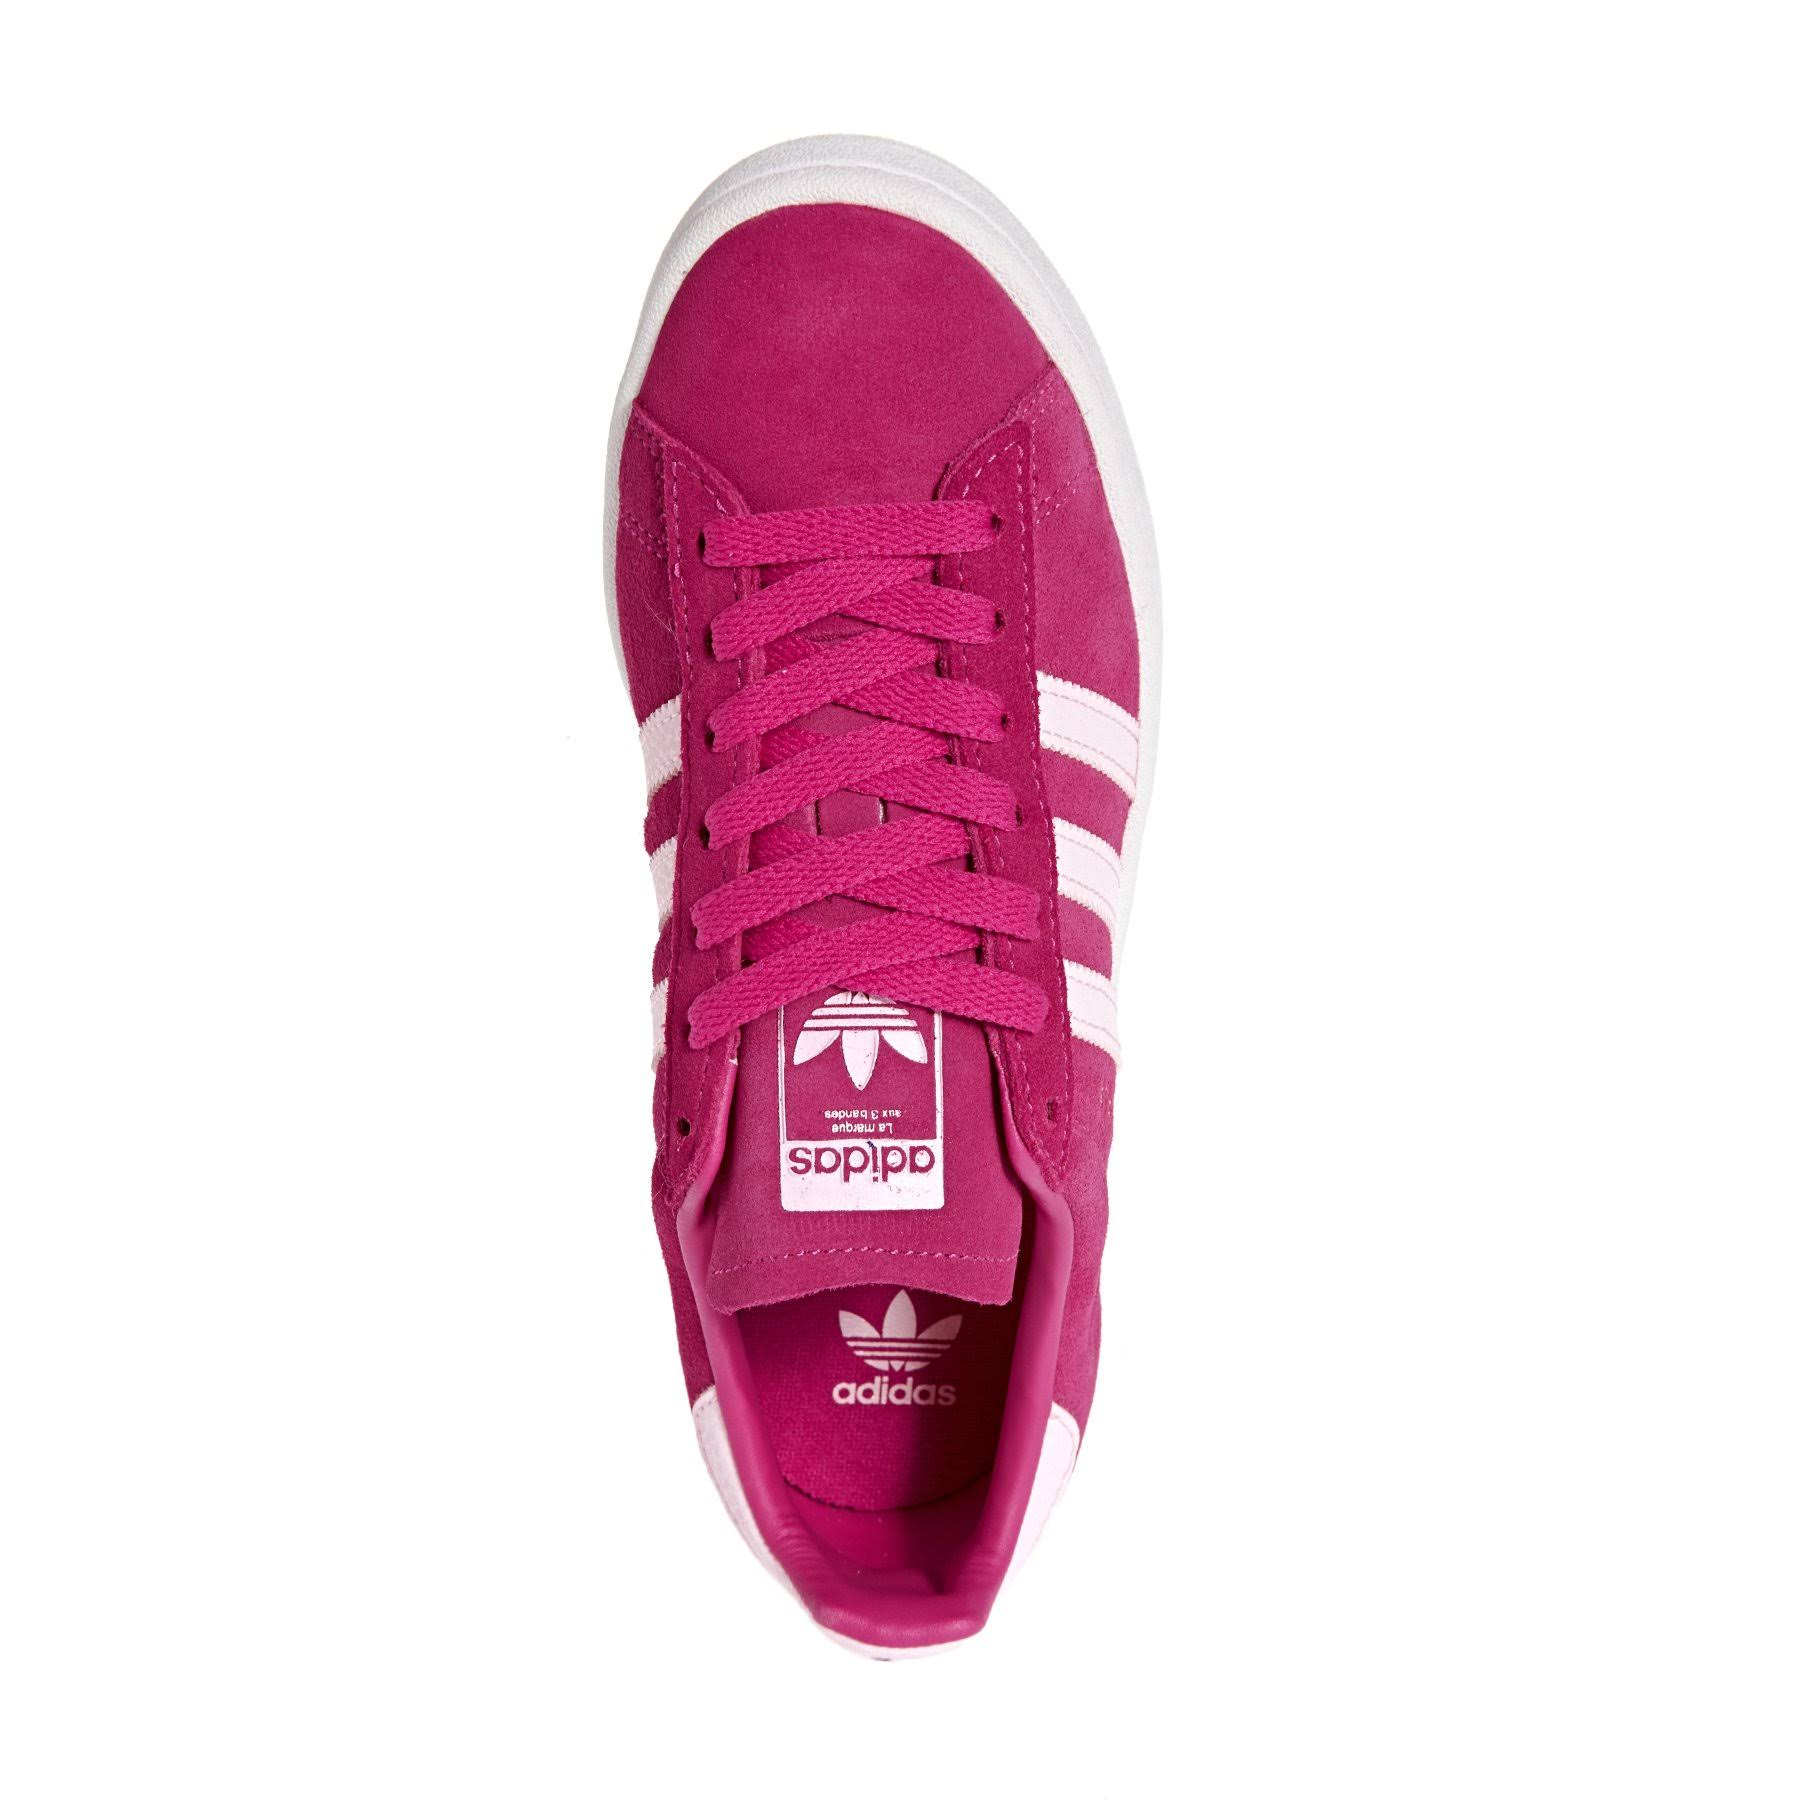 Adidas Adidas Rosa Scarpe Campus Campus Scarpe 8wvmNn0